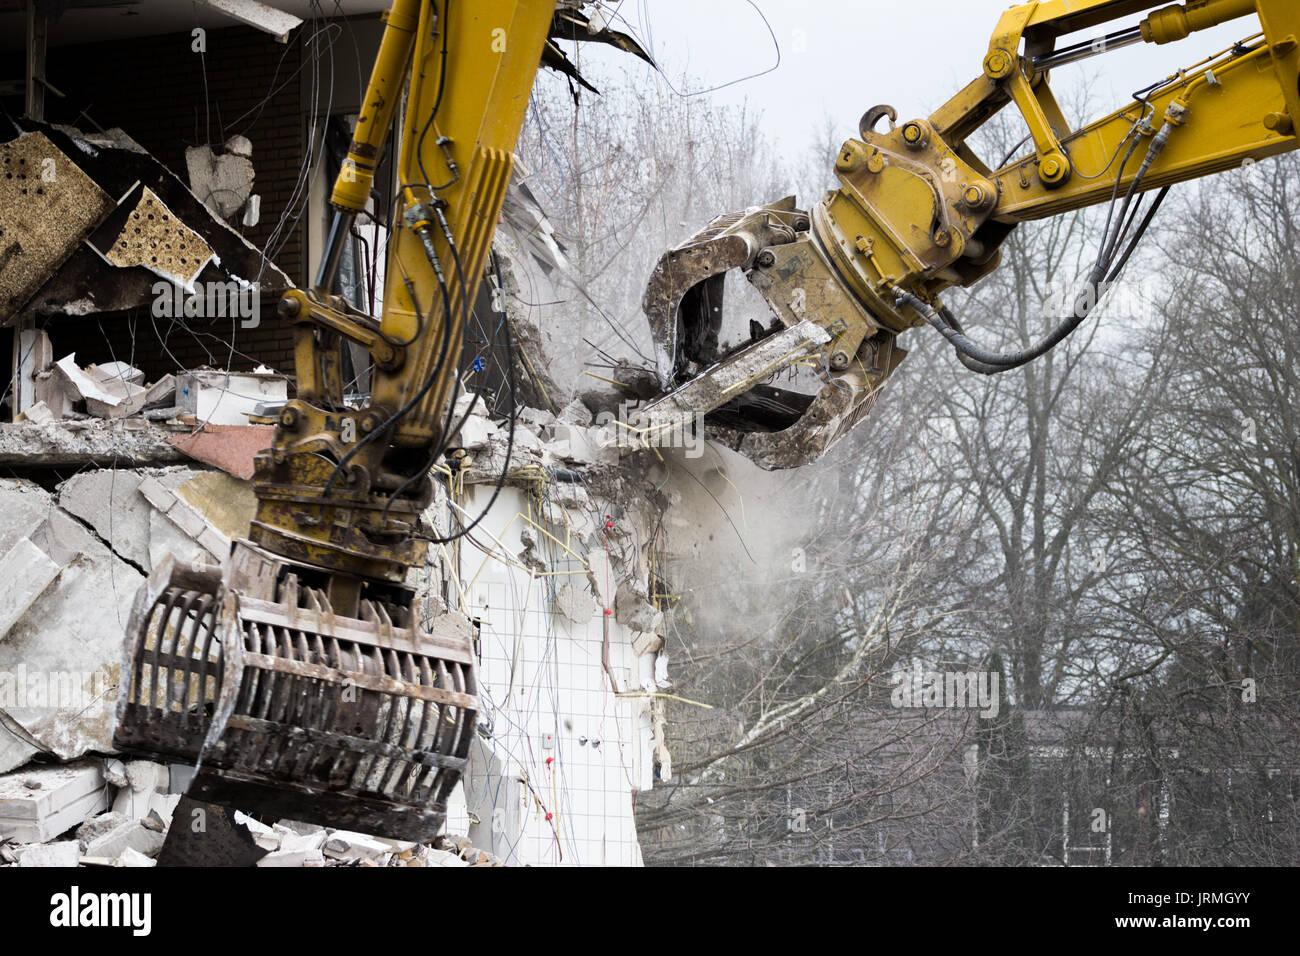 Demolition cranes dismantling a building Stock Photo